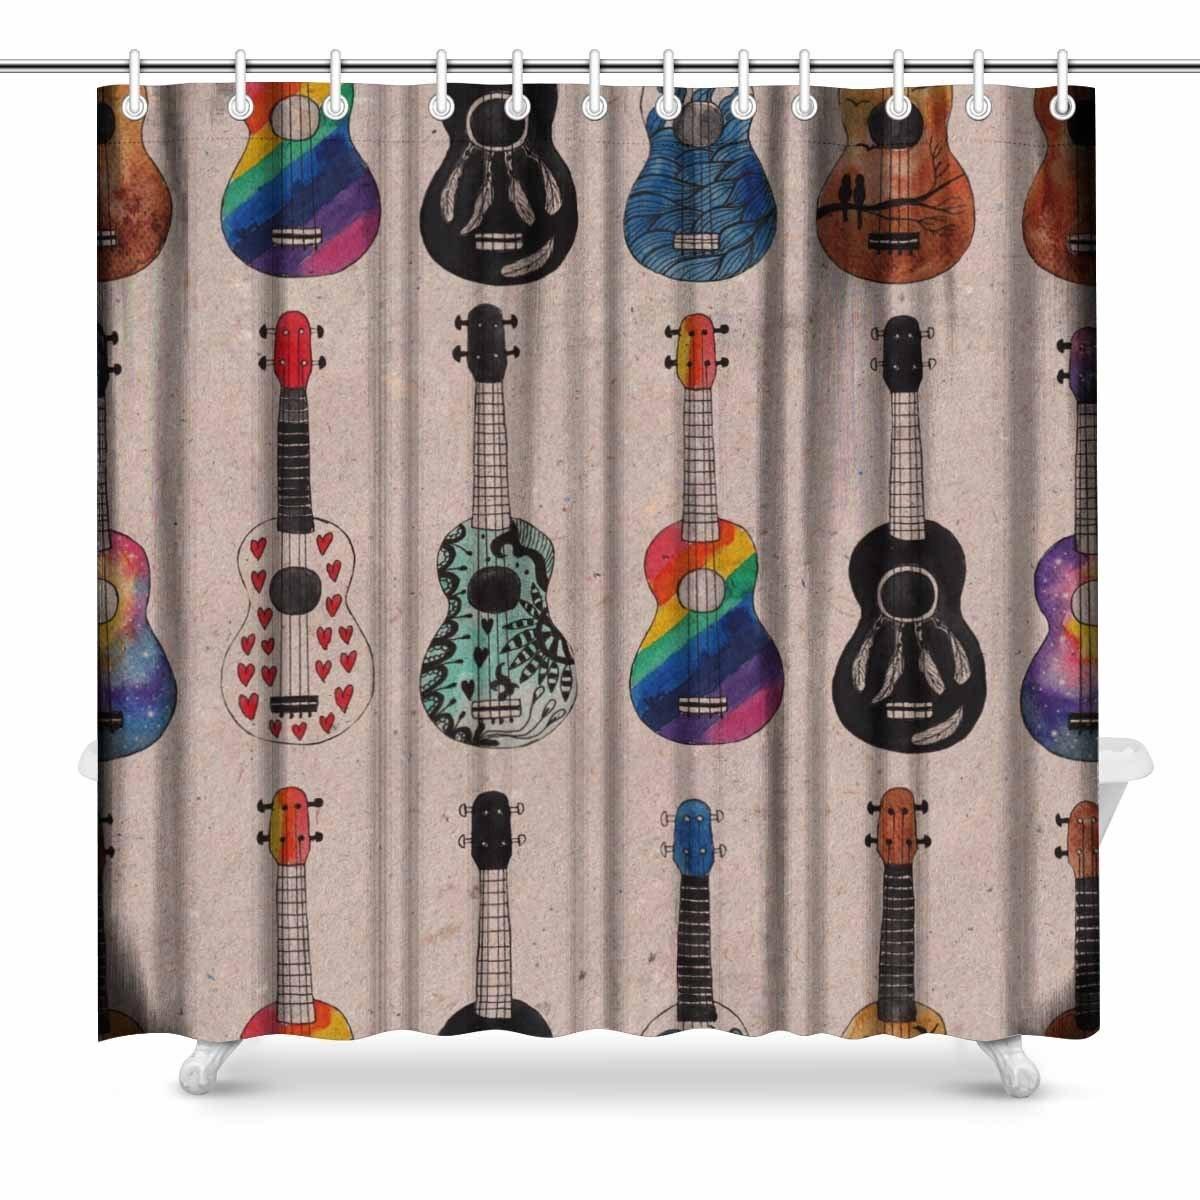 Aplysia Ukulele Hawaiian Guitars Kraft Fabric Bathroom Decor Shower